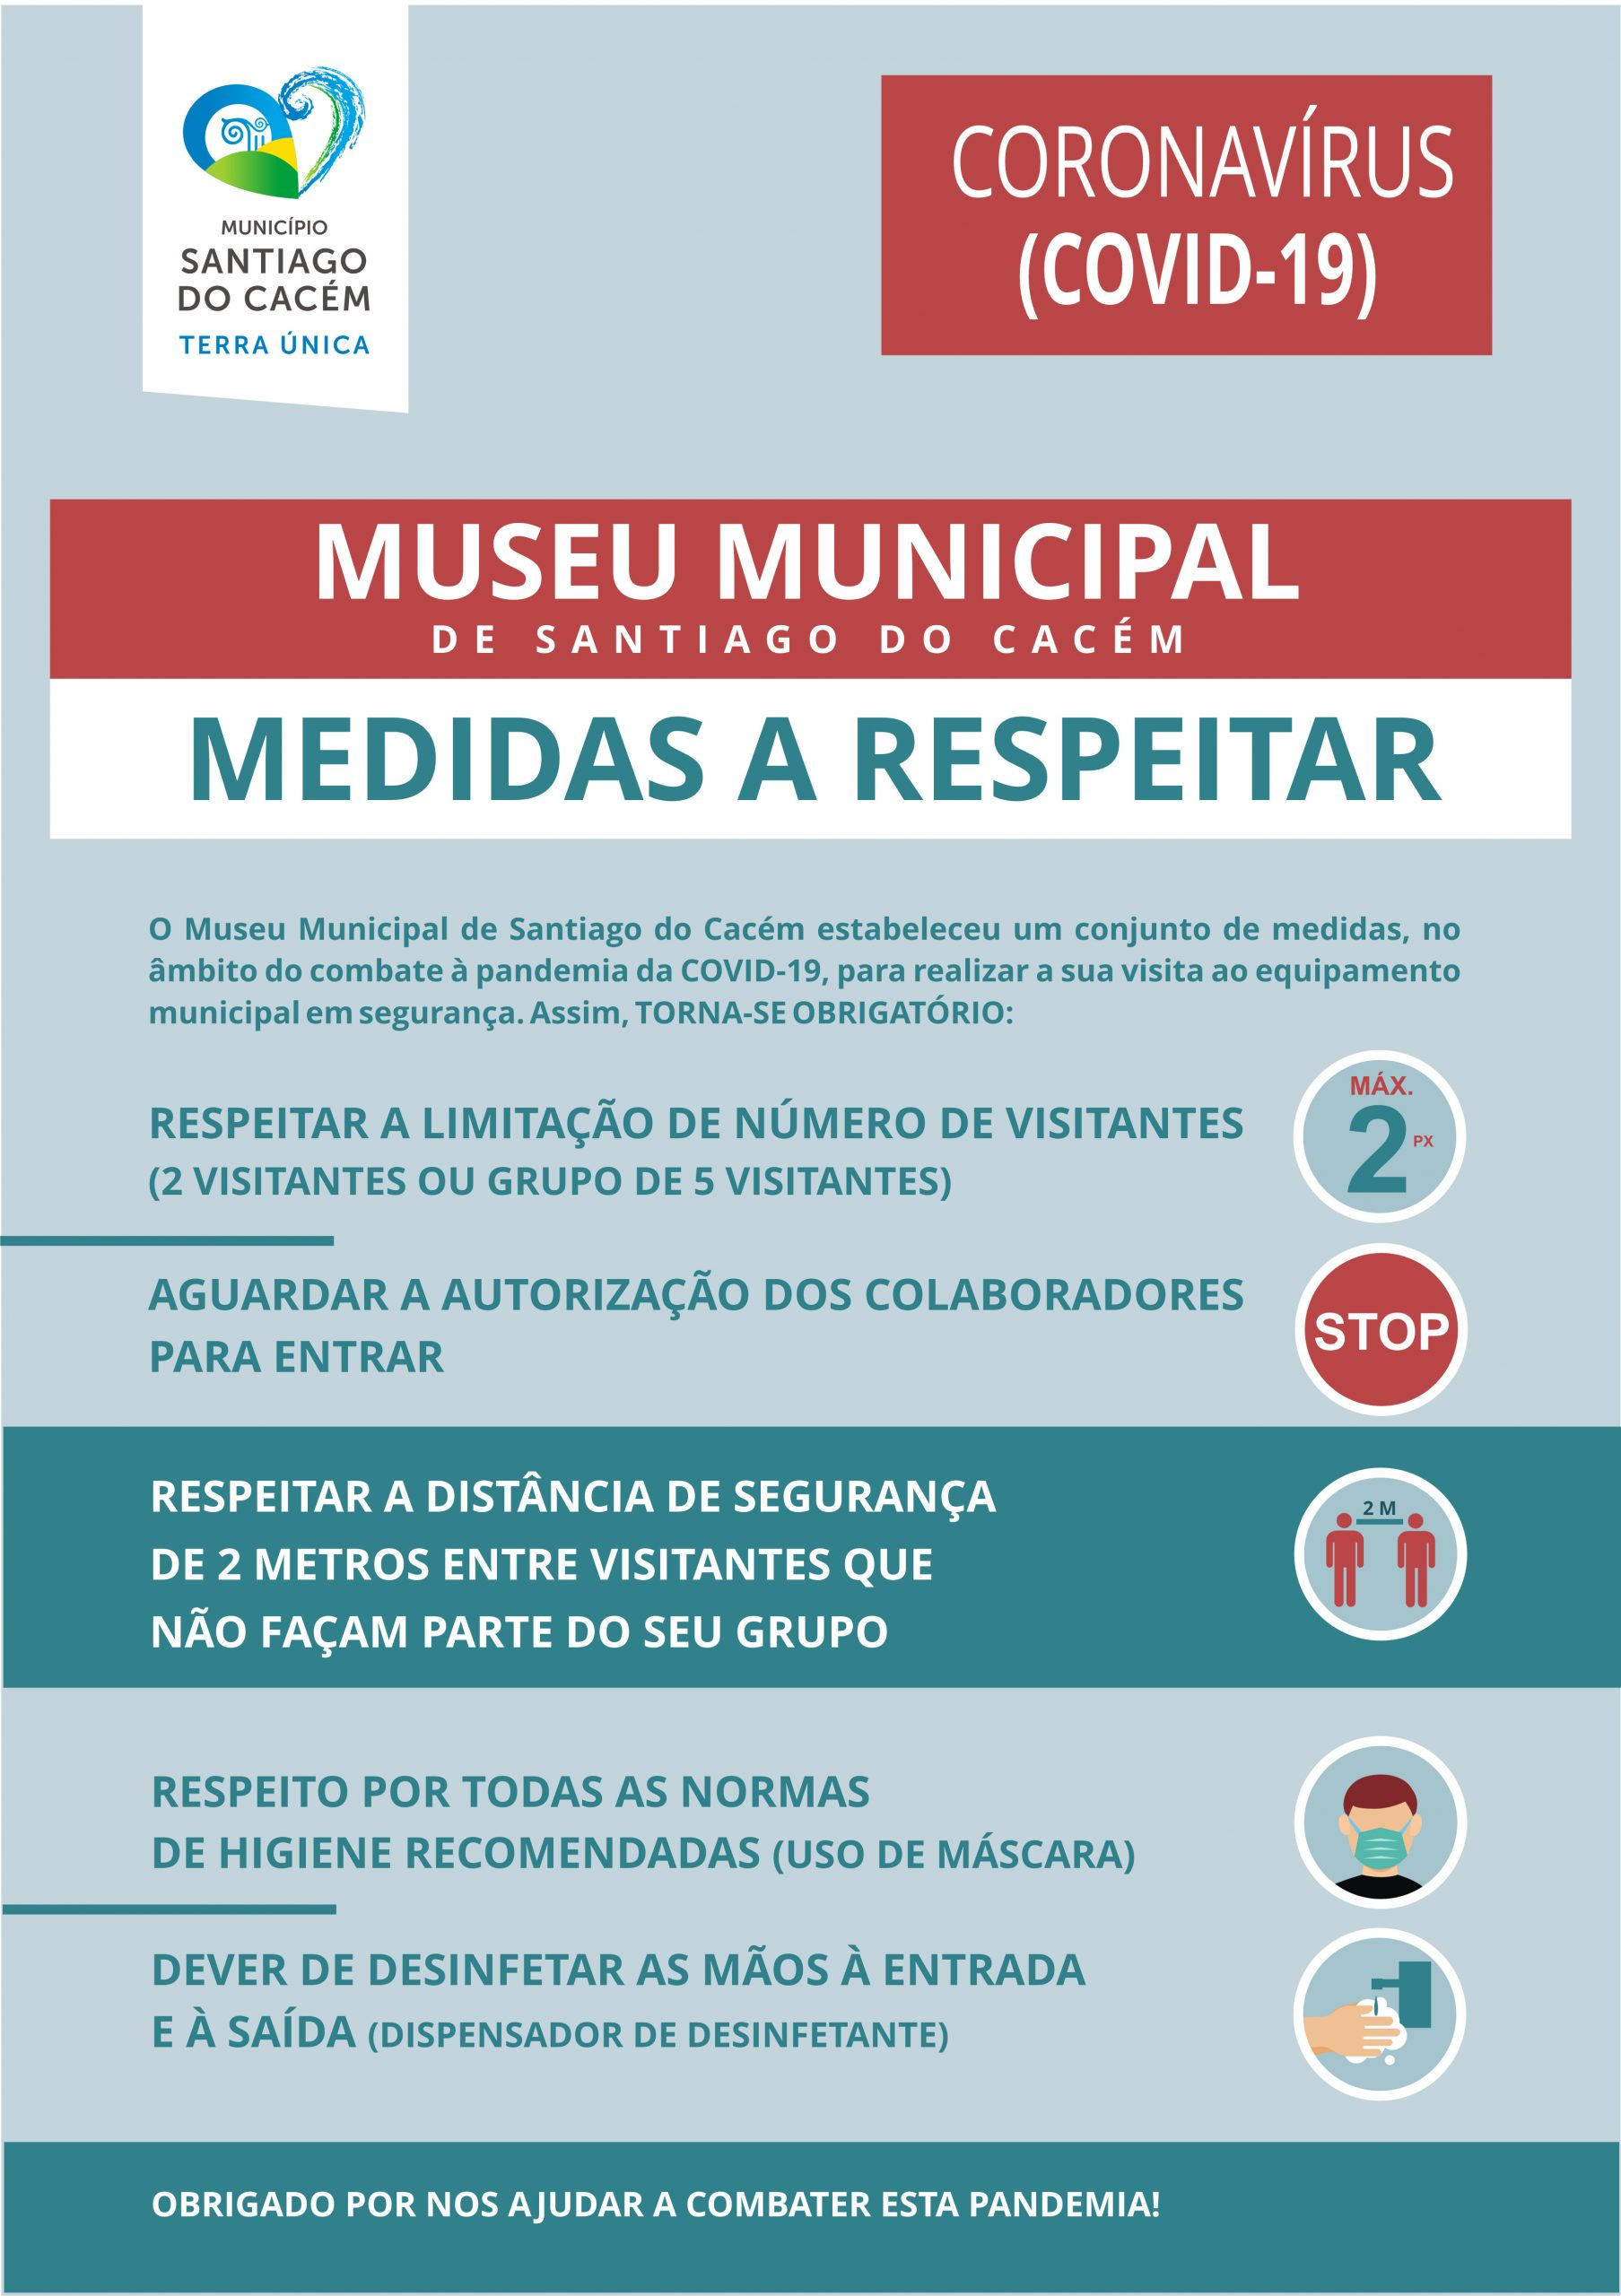 medidas a respeitar nas visitas ao museu municipal